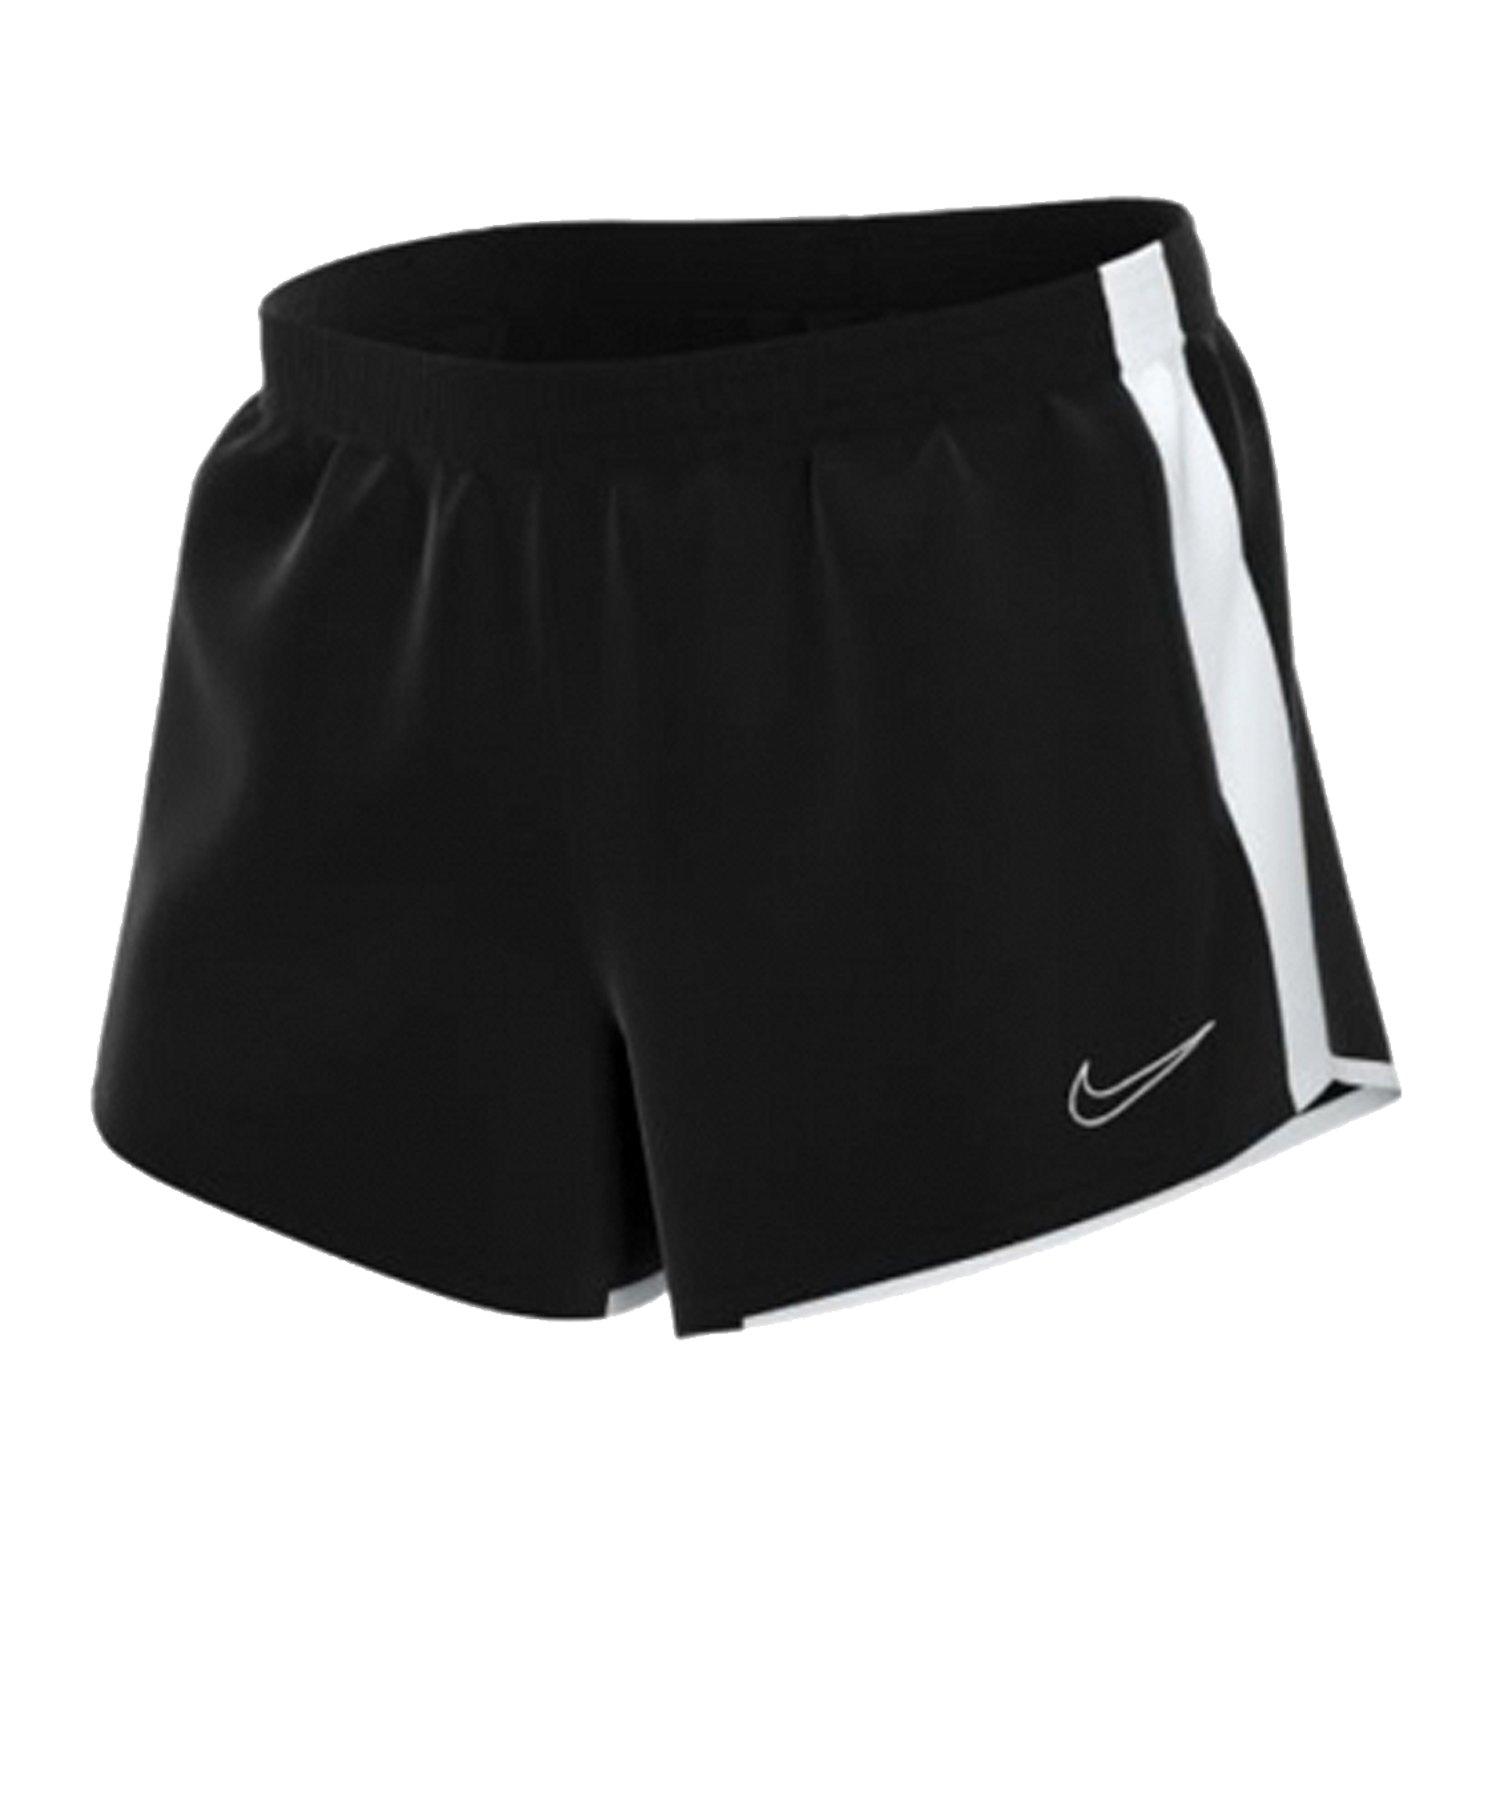 Nike Academy 19 Knit Short Damen F010 - schwarz